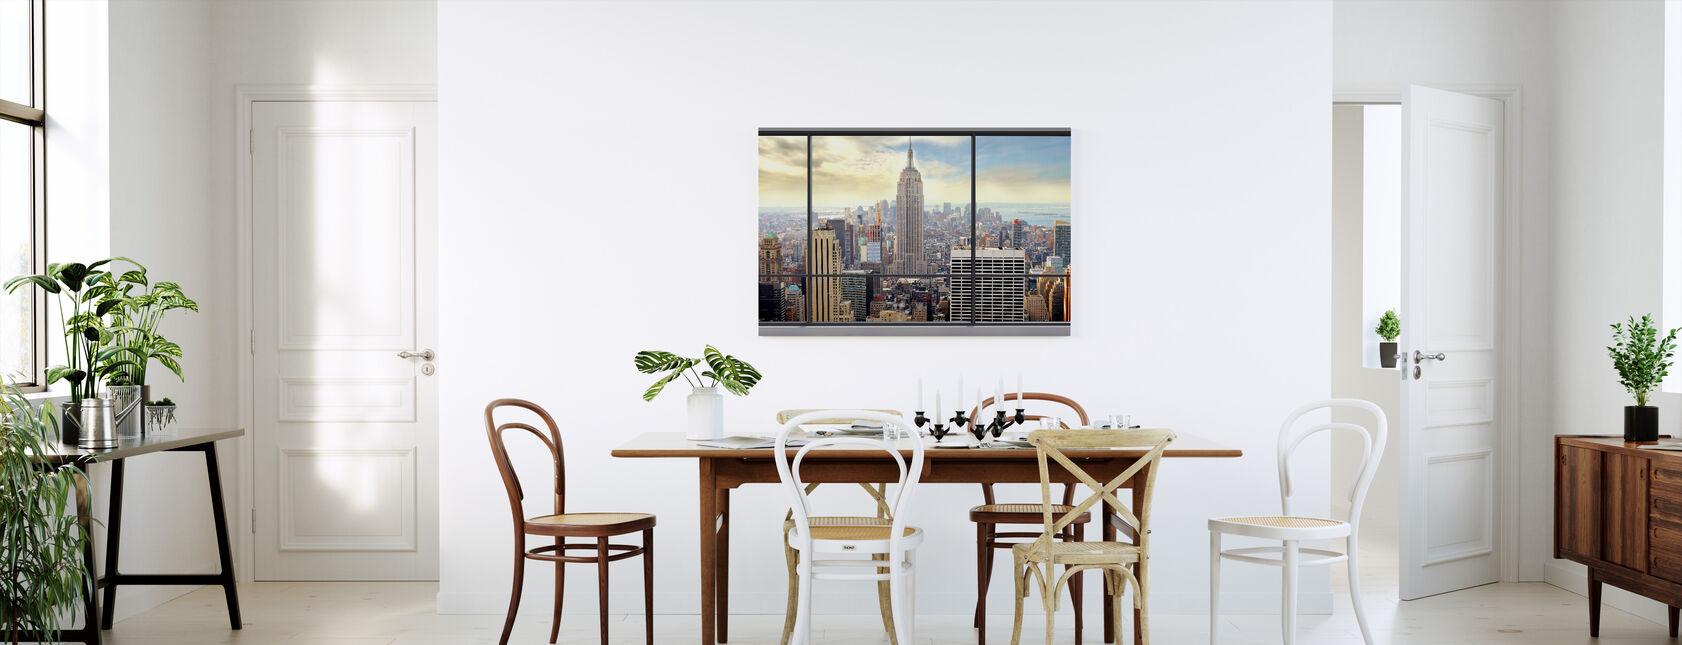 Penthouse Window View - Canvas print - Kitchen